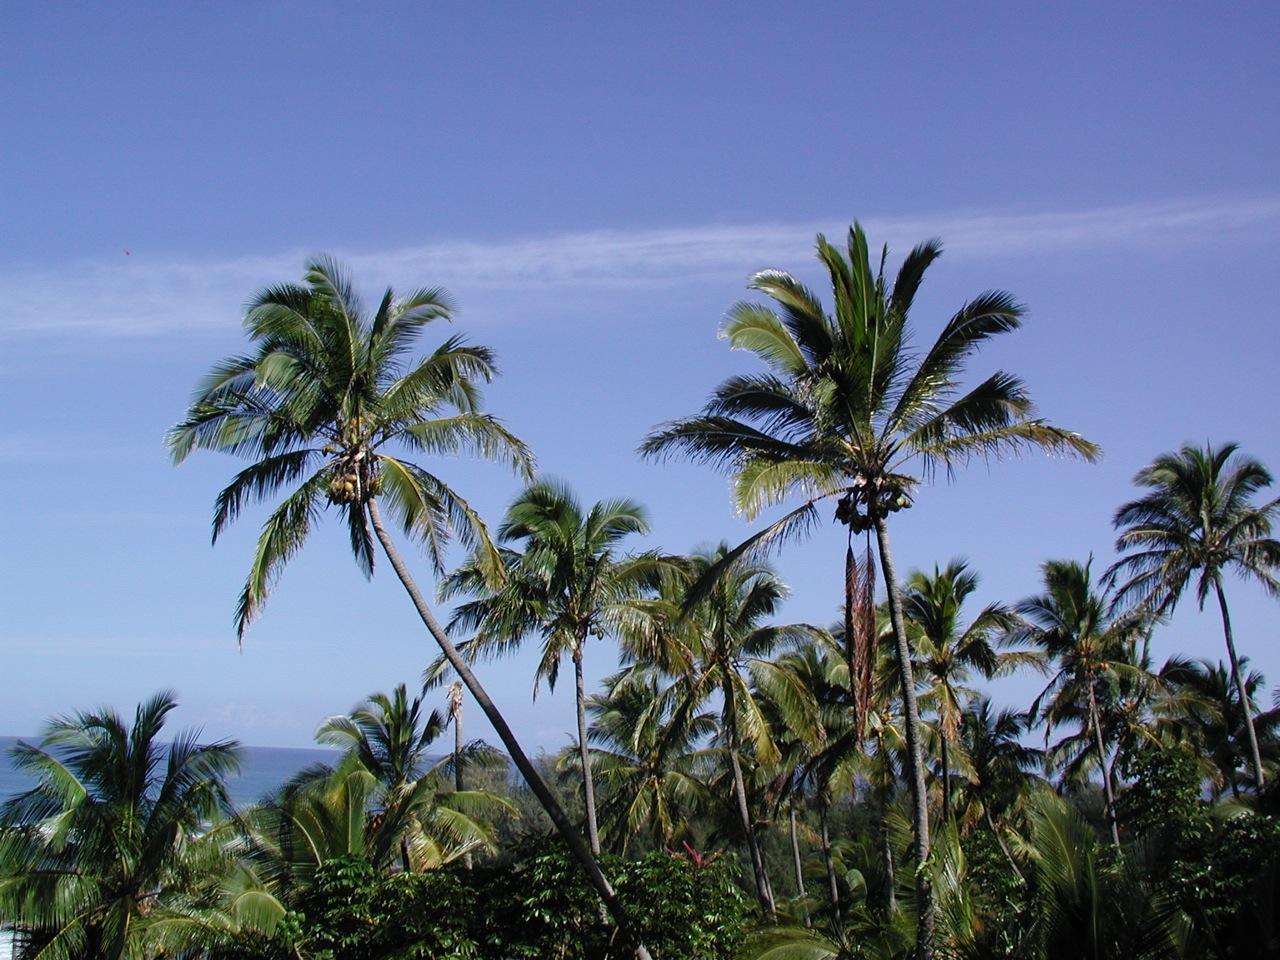 Grove of palms